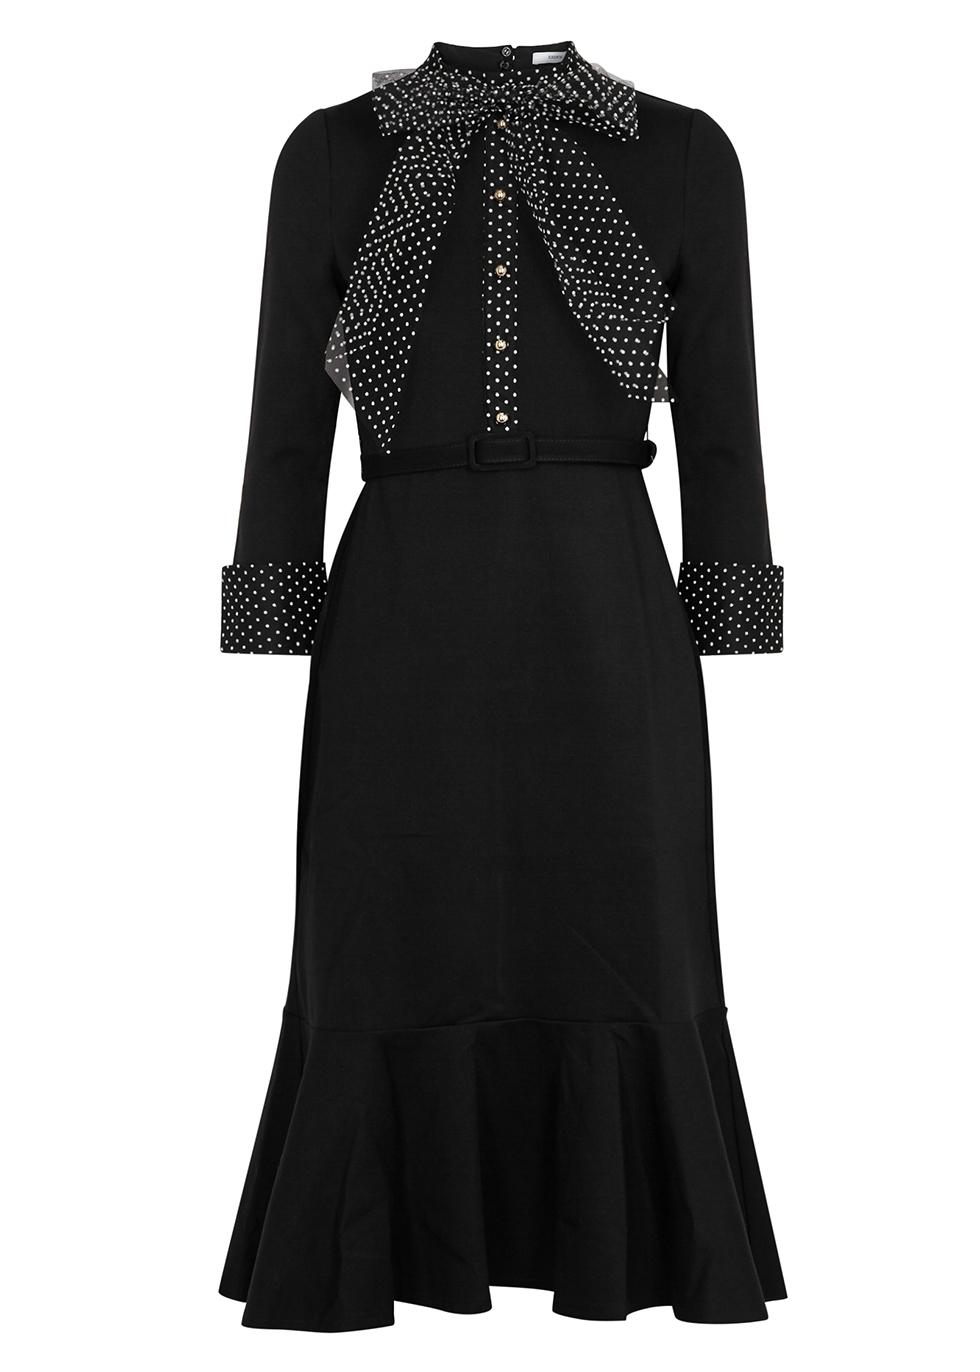 226bf0ab53c Designer Dresses   Designer Gowns - Harvey Nichols